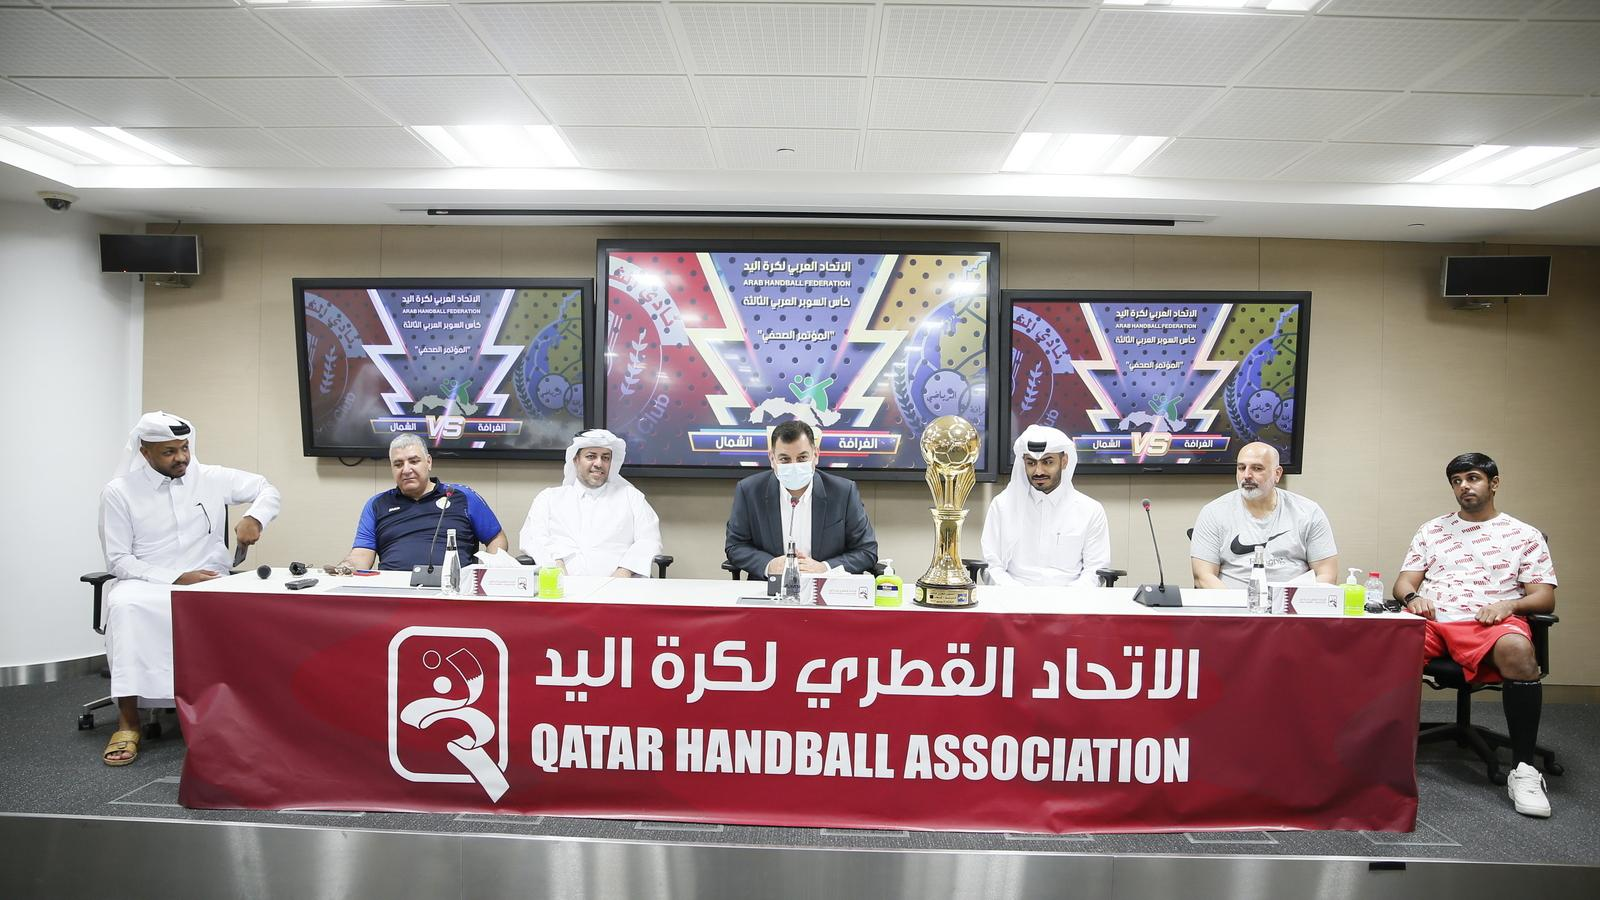 All Qatari-affair as Al Shamal, Al Gharafa set to clash in Arab Handball Super Cup tonight